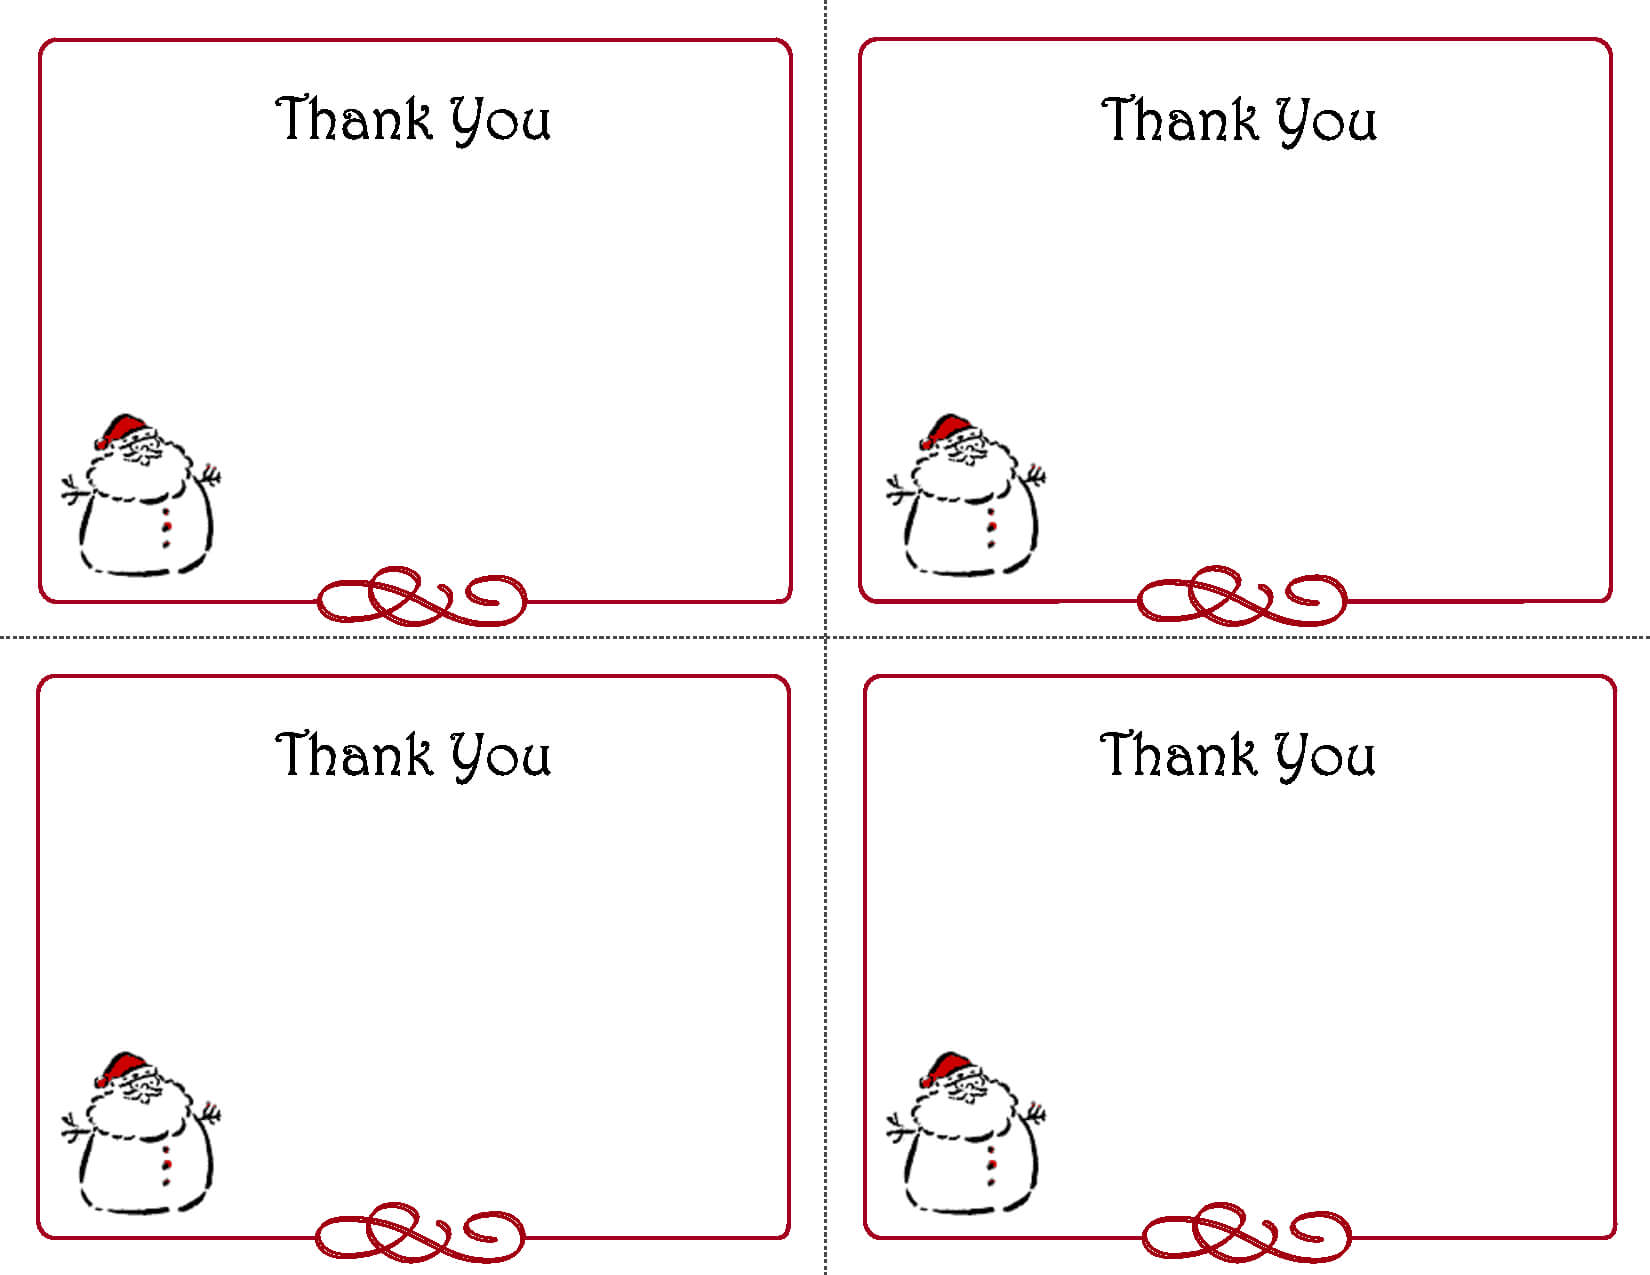 Free Thank You Cards Printable | Free Printable Holiday Gift regarding Free Printable Thank You Card Template